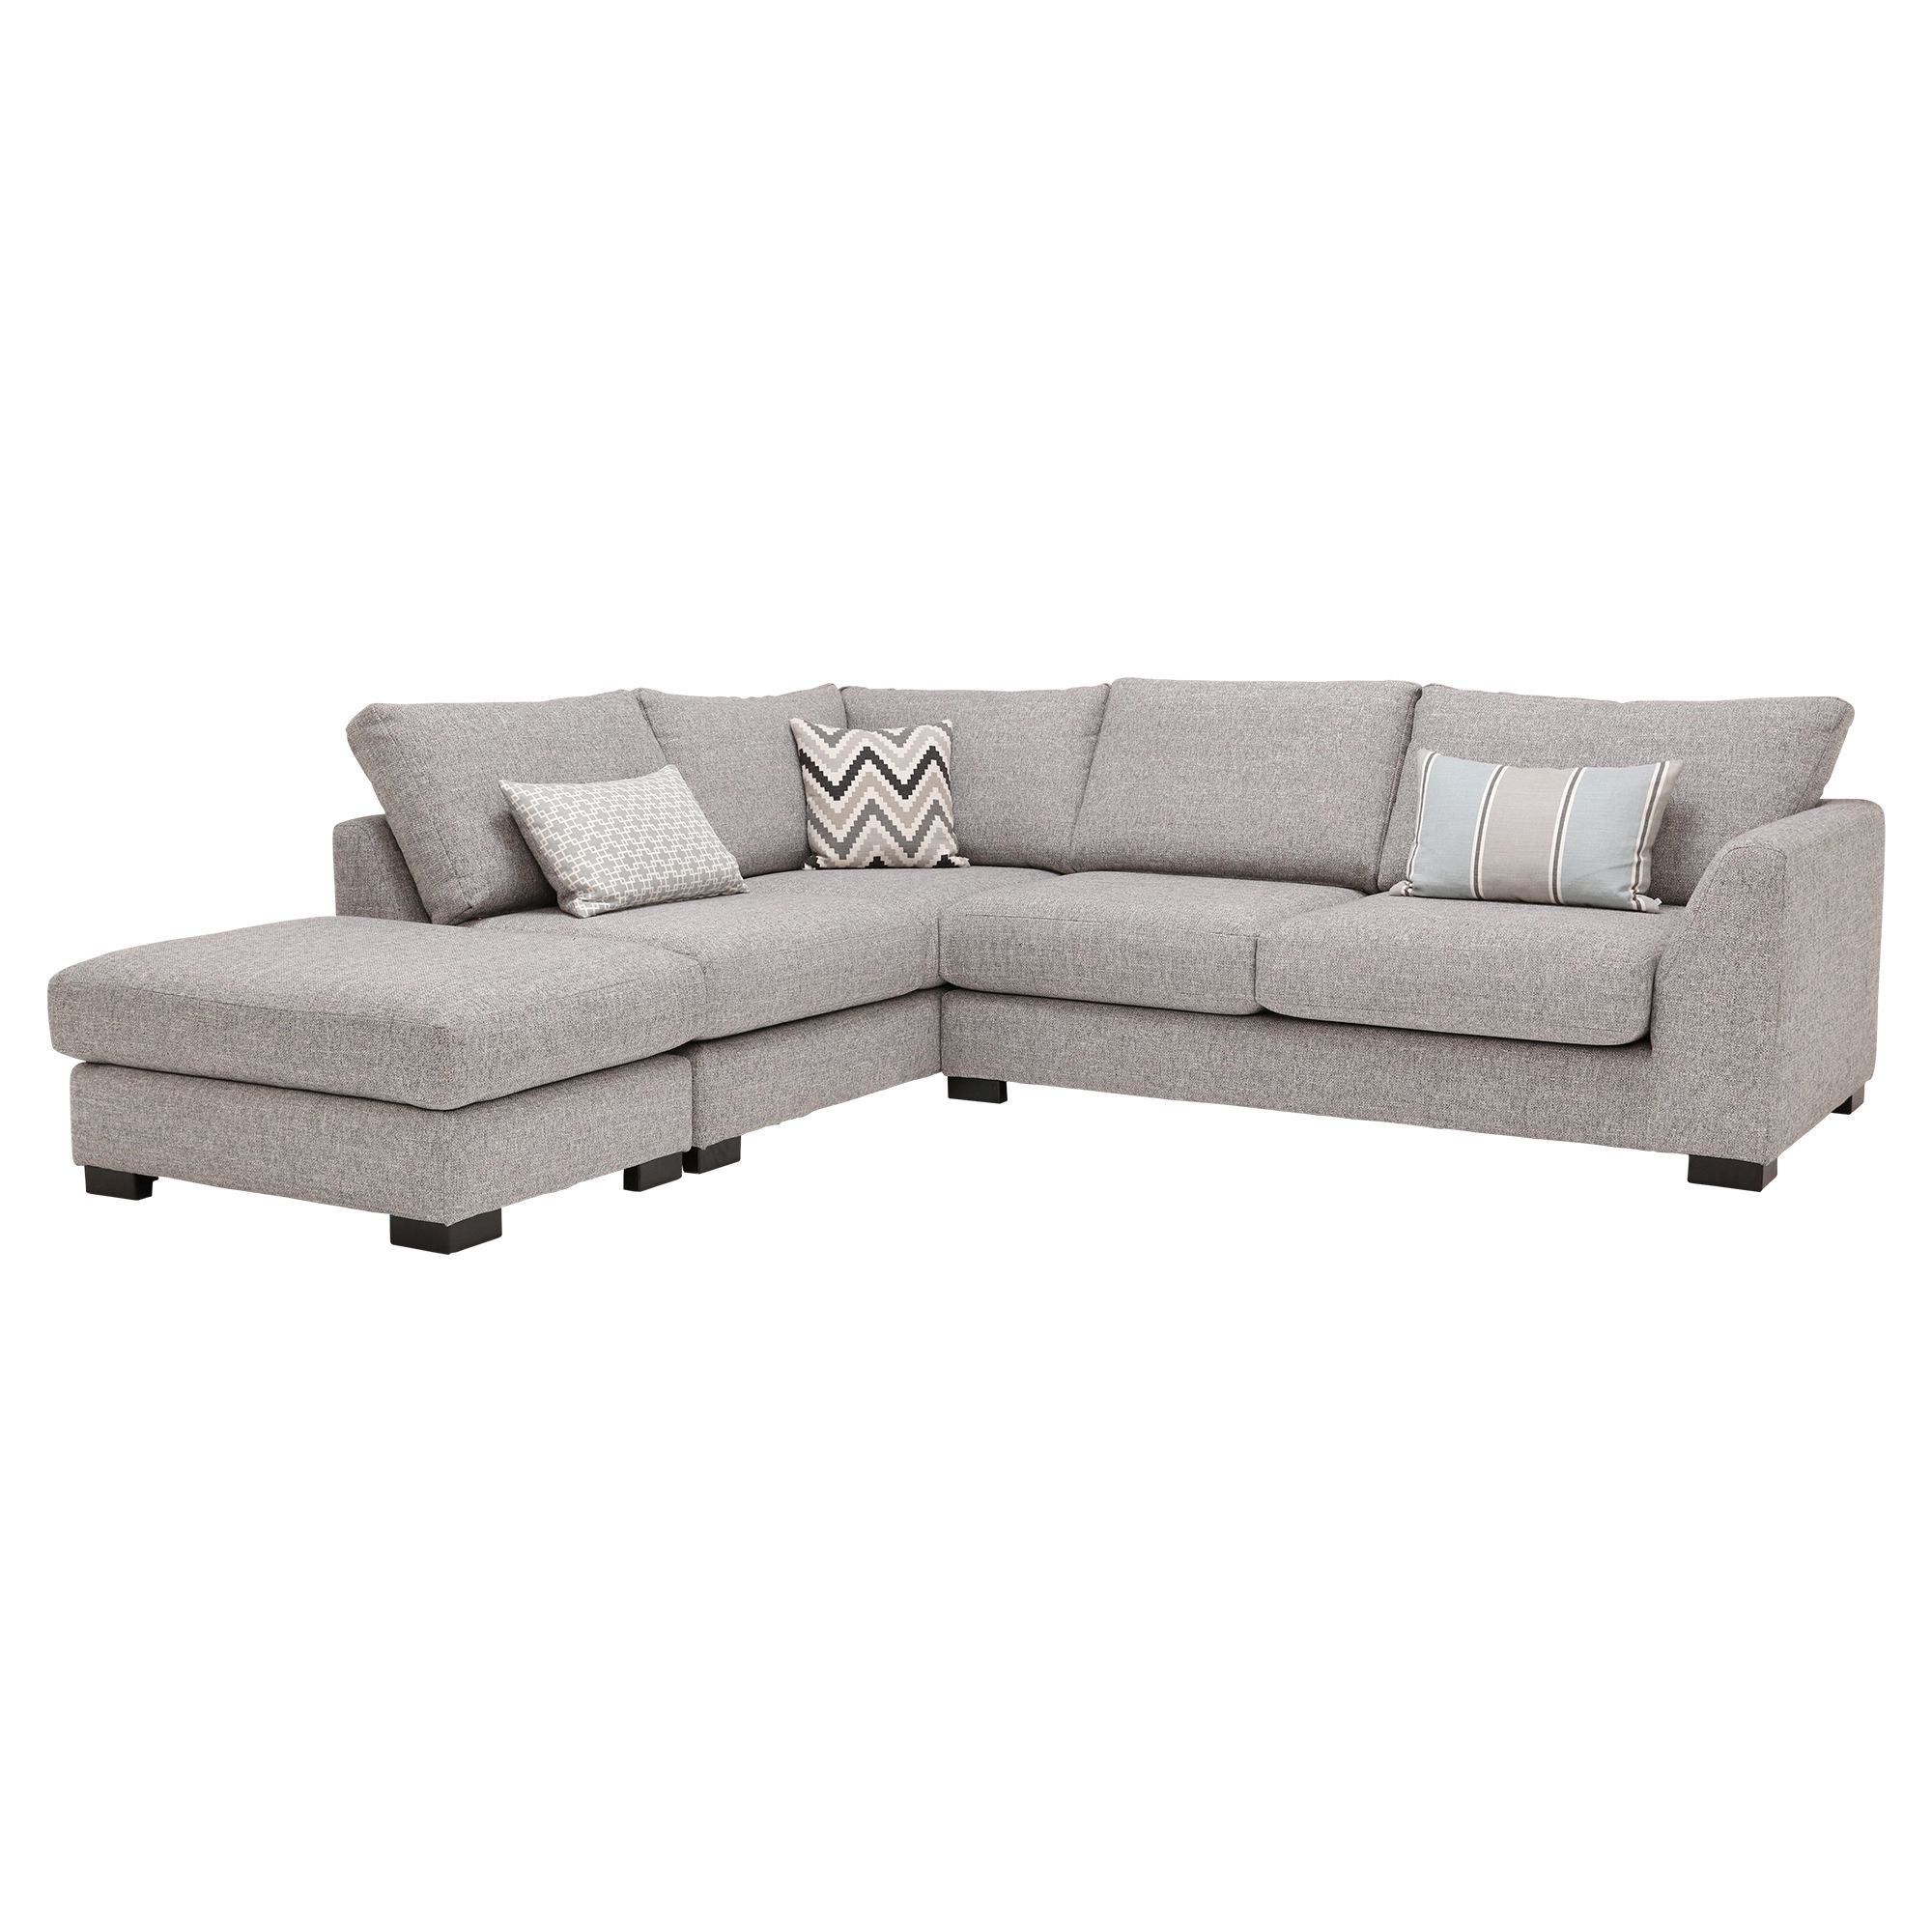 Stamford Lhf Corner Sofa With Stool Grey Barker Stonehouse